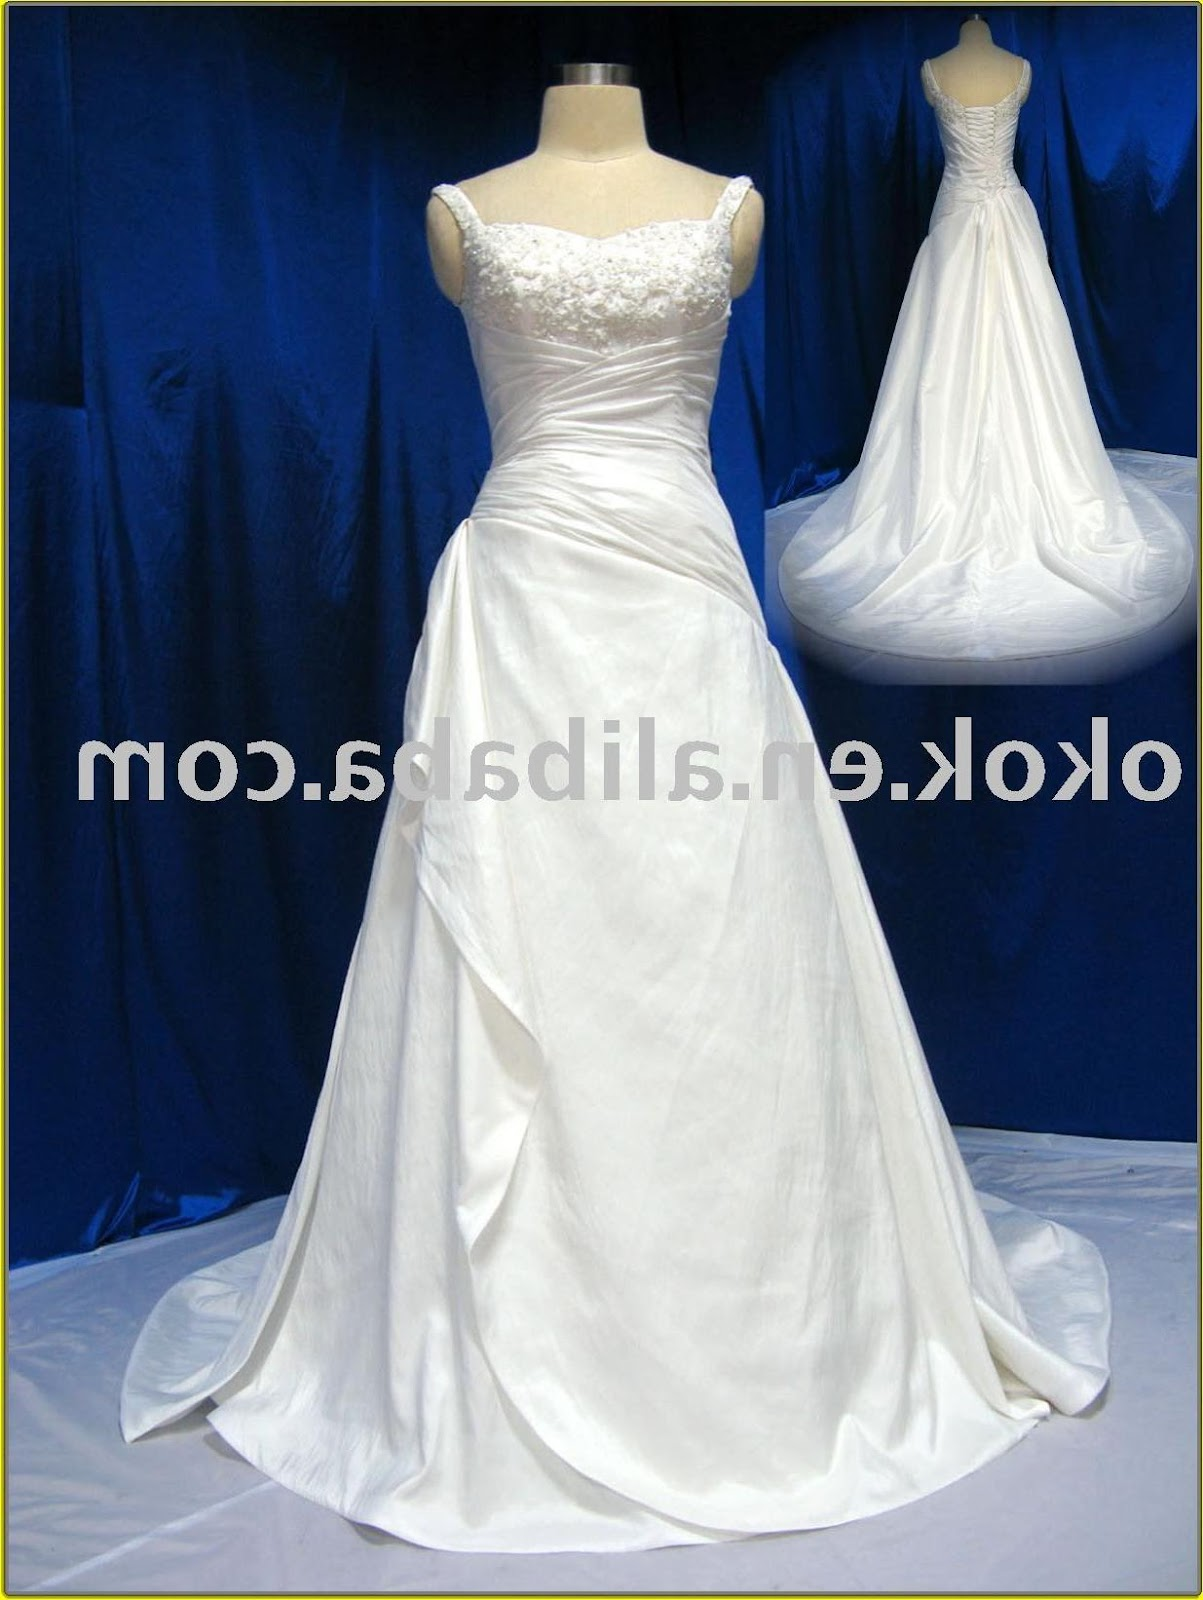 Beautiful Owl Themed Wedding Mold - Blue Wedding Color Ideas ...